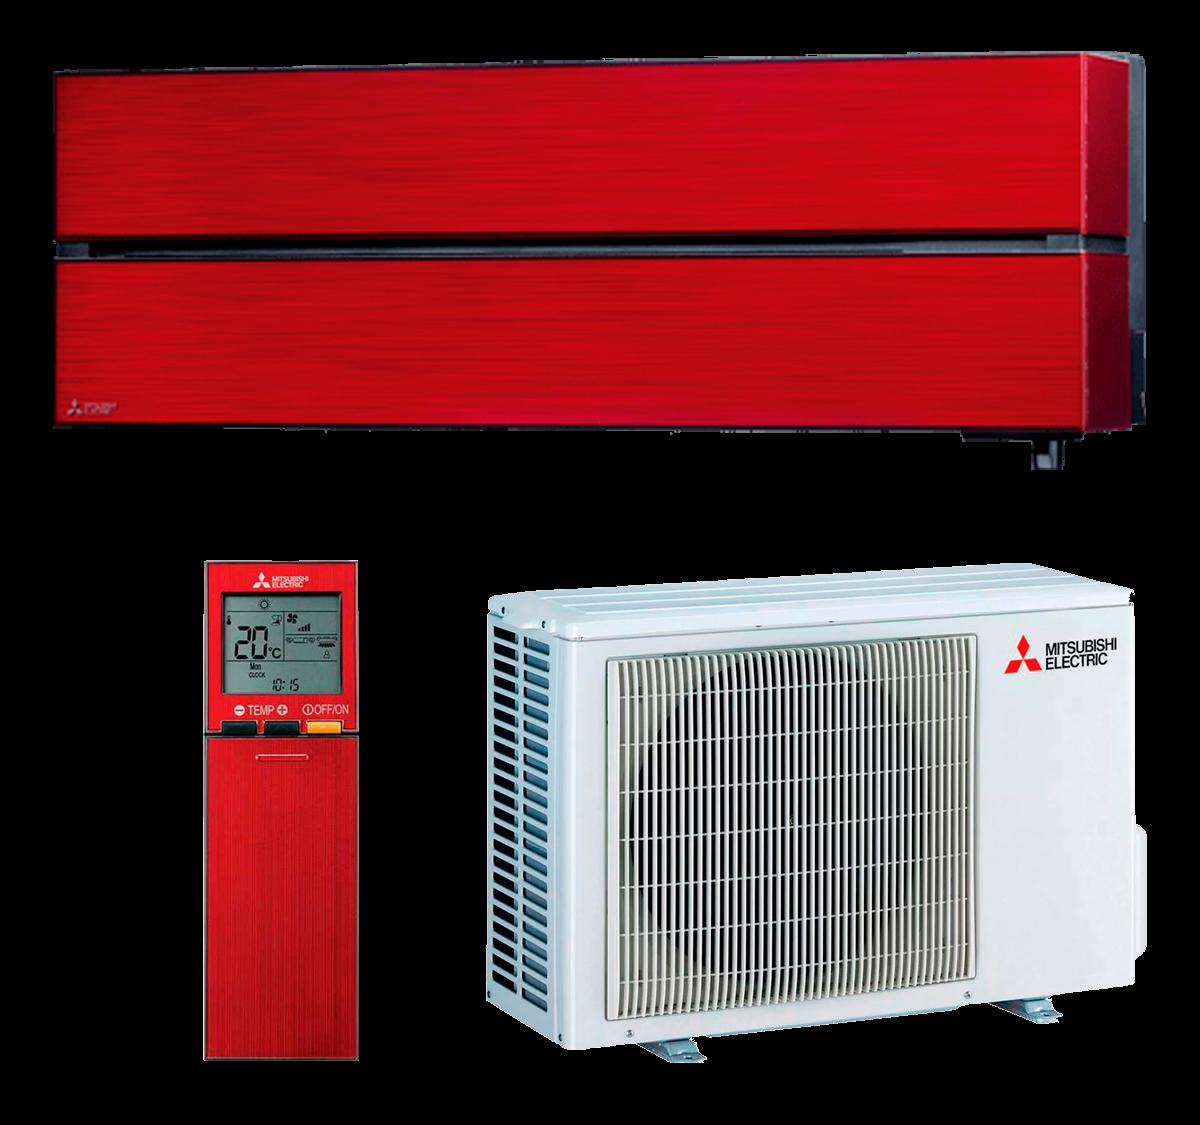 aire acondicionado split rojo mitsubishi electric inverter serie kirigamine style modelo msz ln35vgr precio incluido instalacion caseragua 01